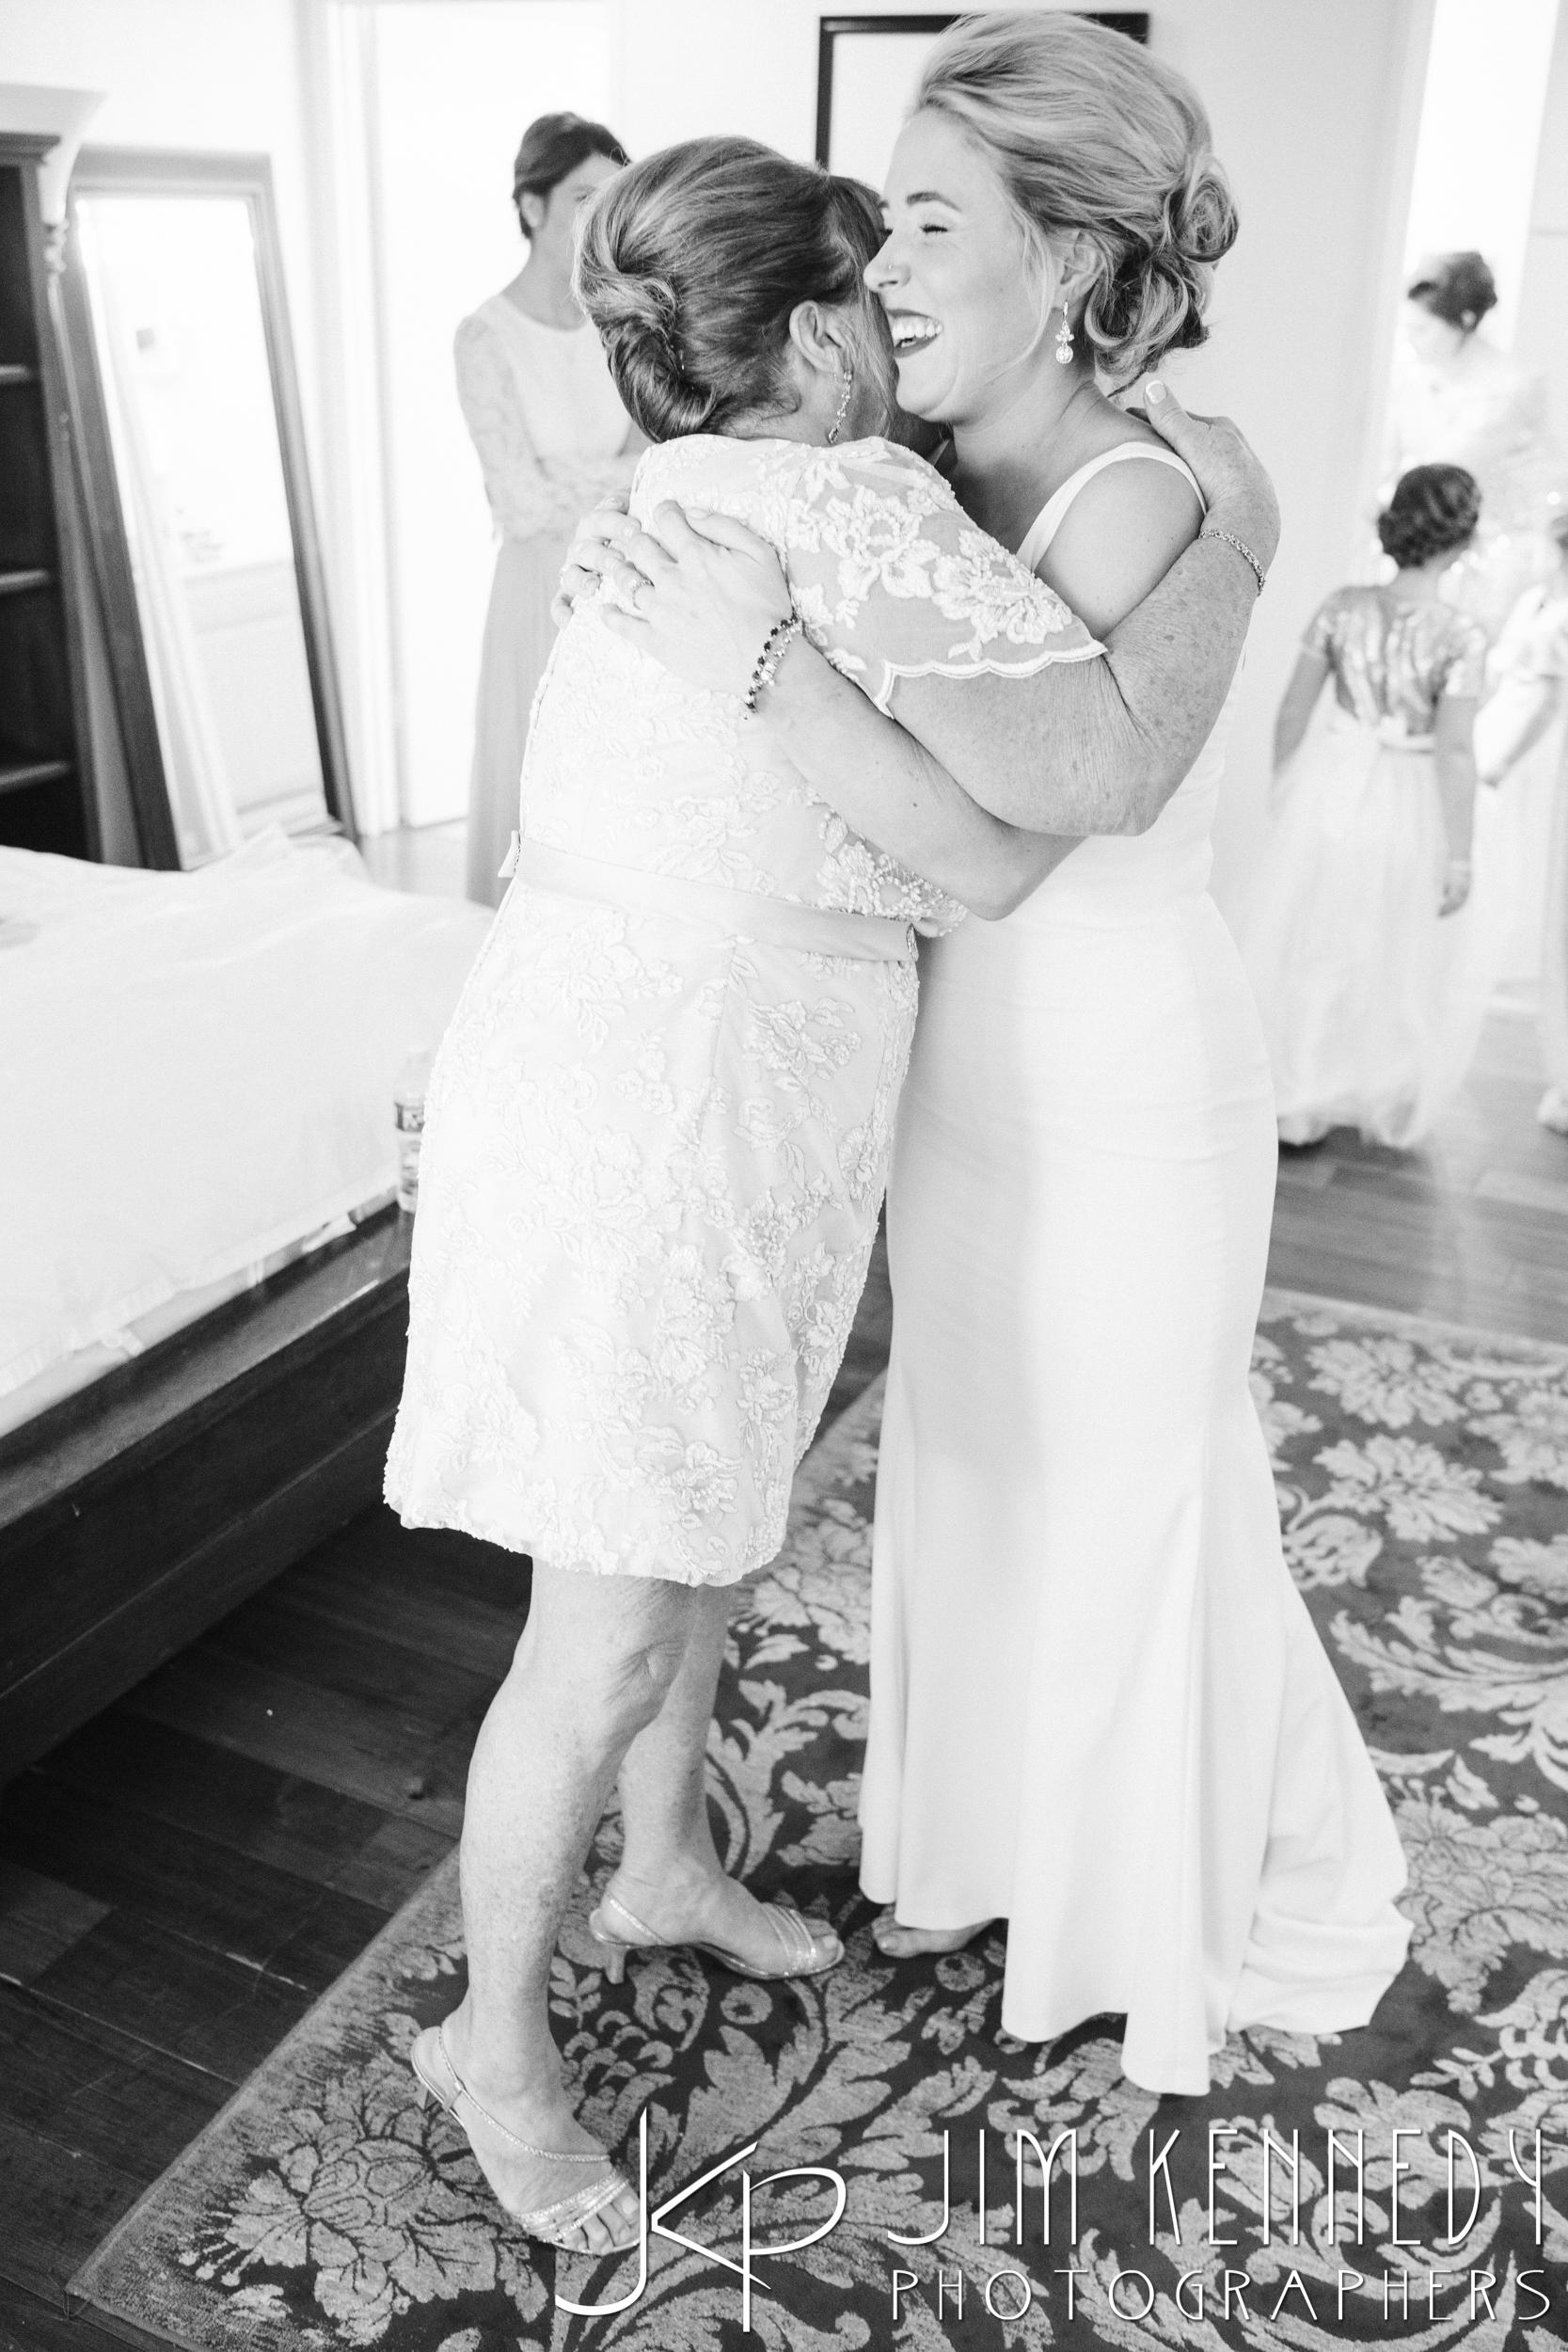 jim_kennedy_photographers_highland_springs_wedding_caitlyn_0049.jpg